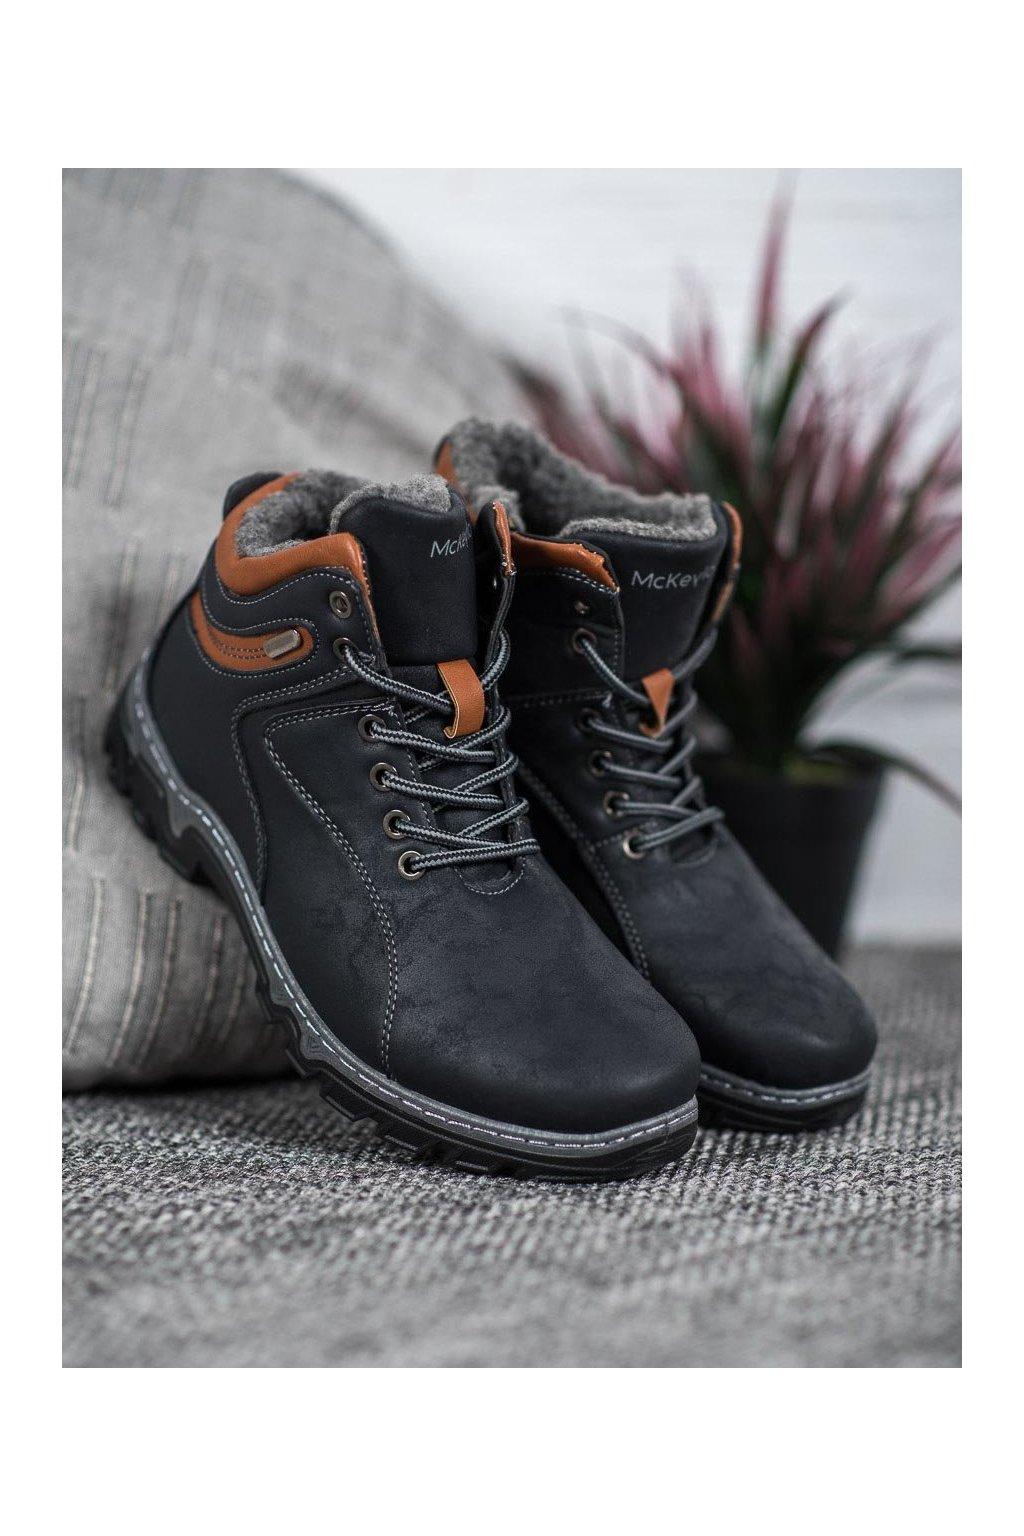 Fialové dámske trekové topánky Mckeylor kod OCA20-2156N